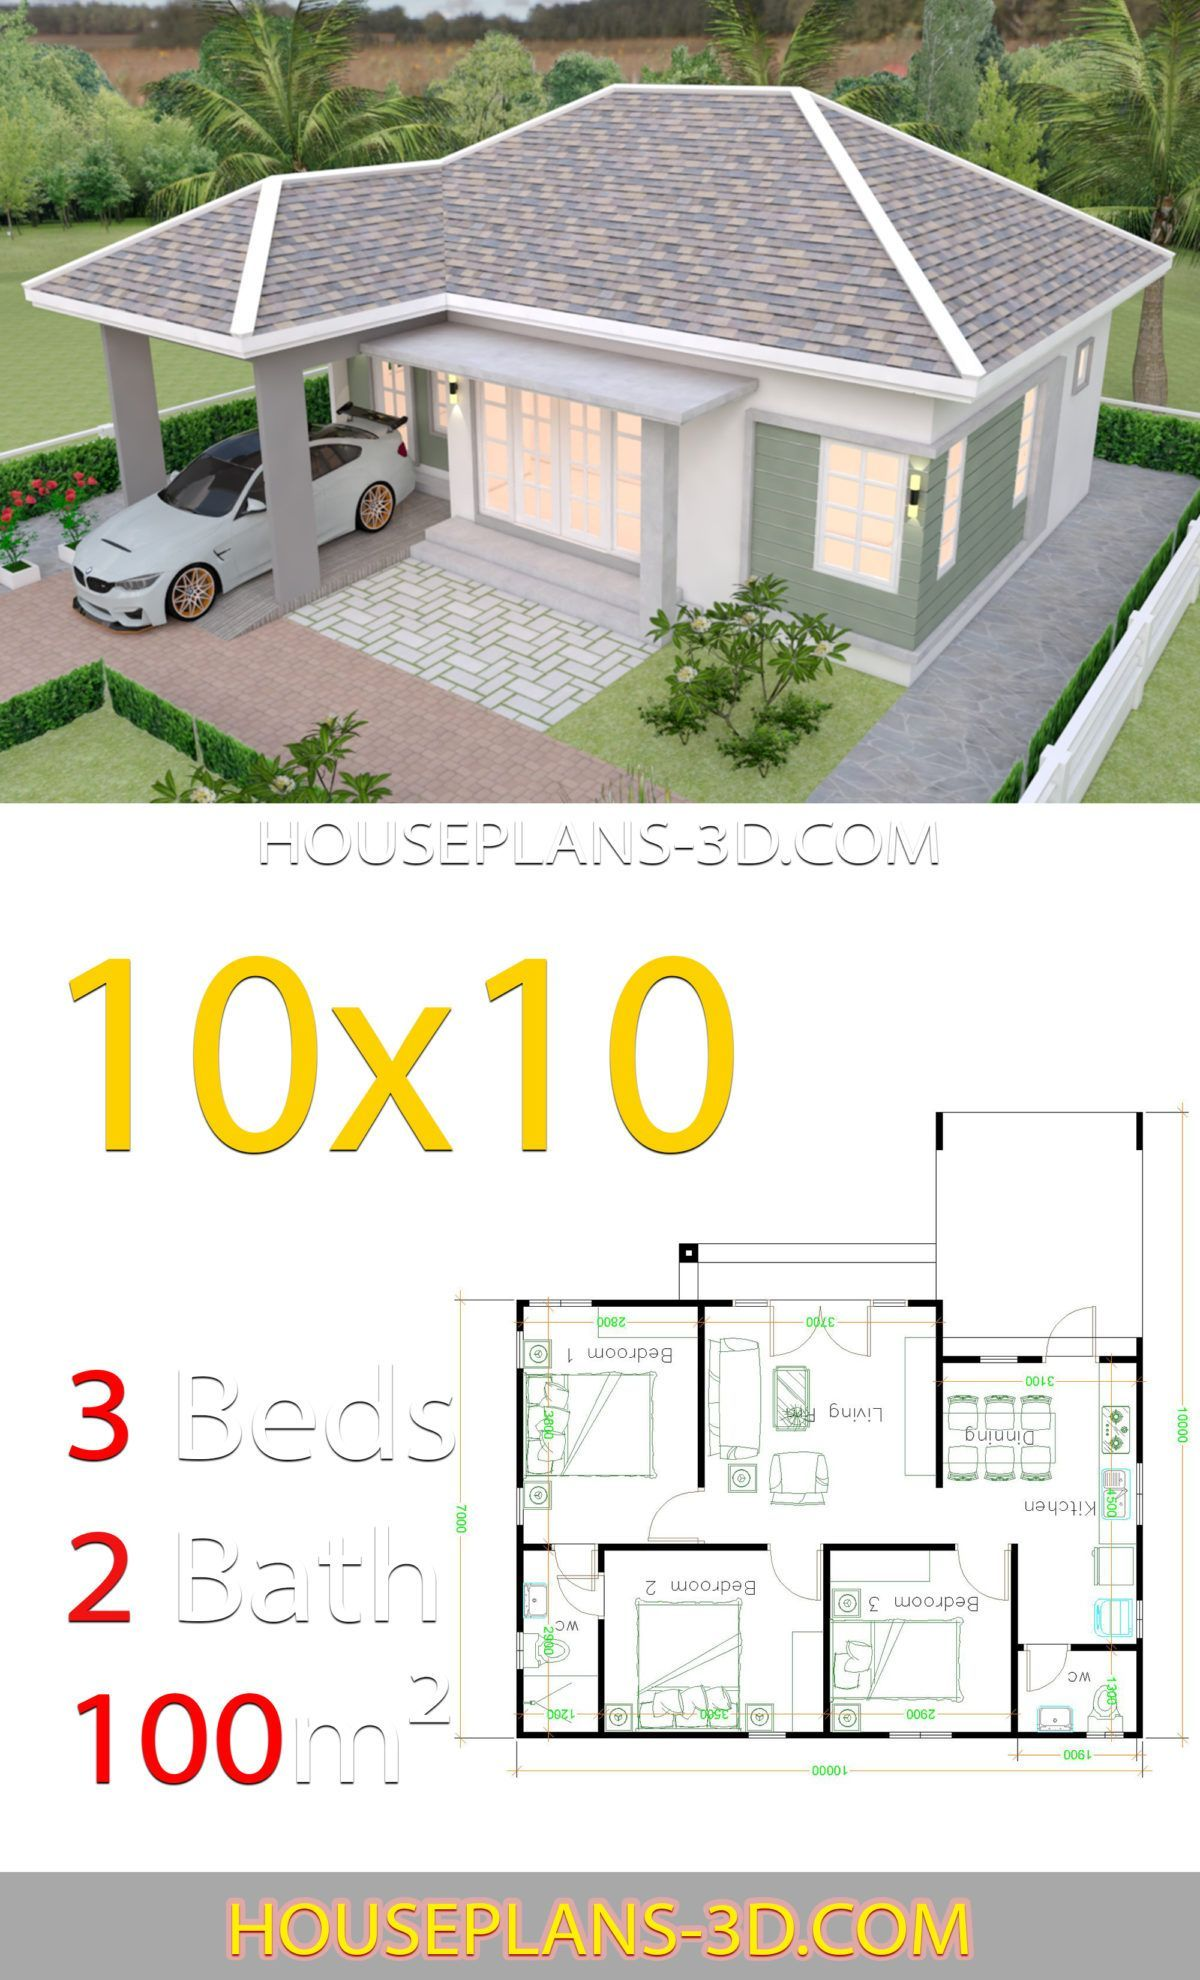 10x10 Bedroom Floor Plan: Pin On Modern Architecture